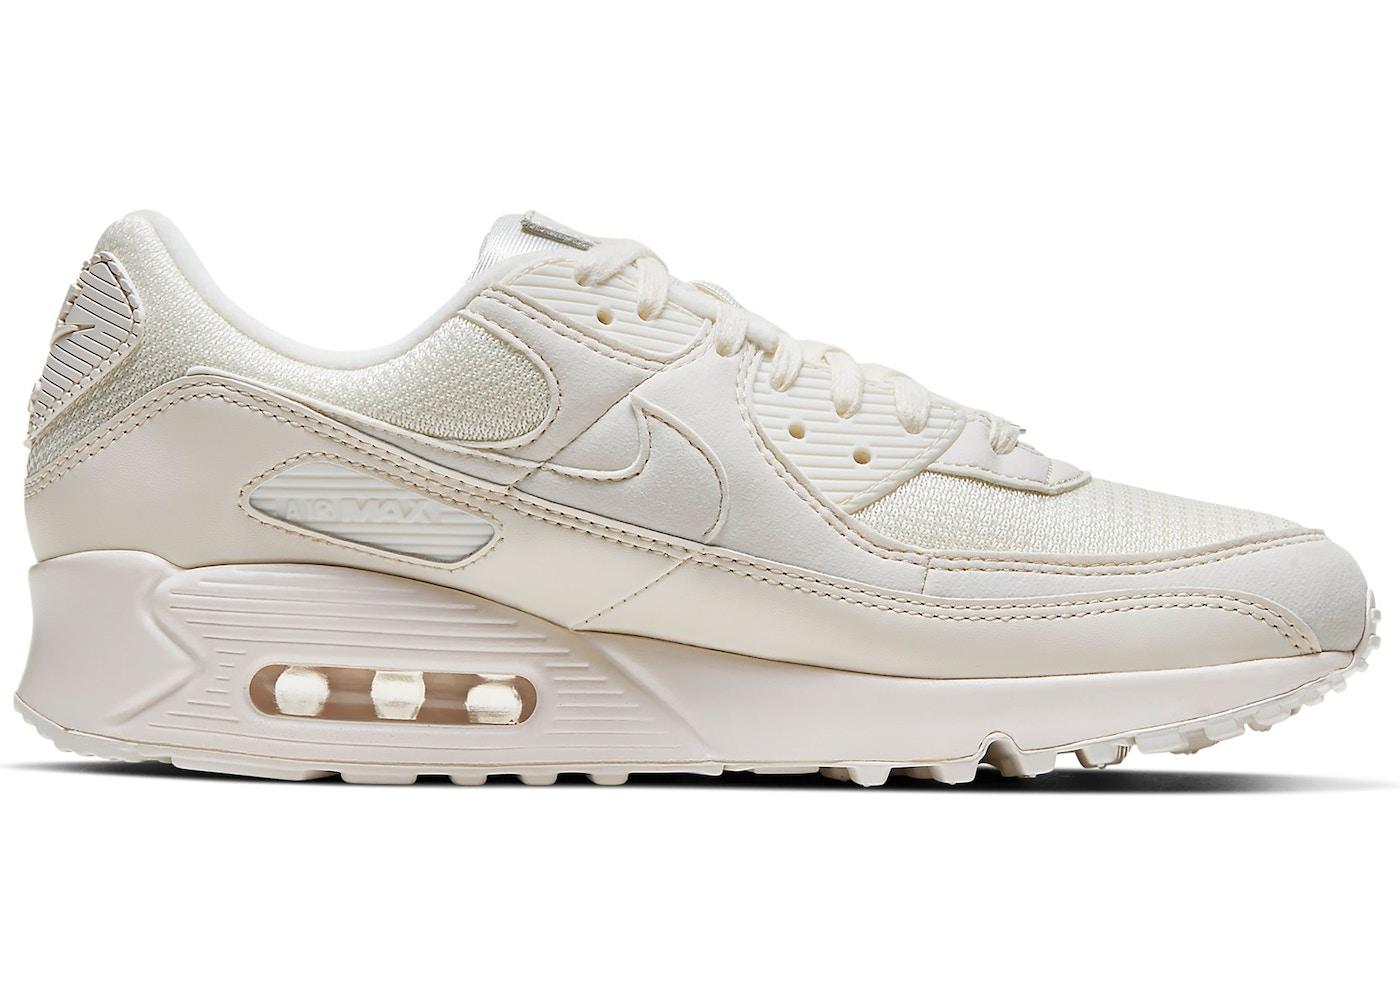 Herren Nike Air Max 95 Prm 4Th Of July Schuhe Im Rot